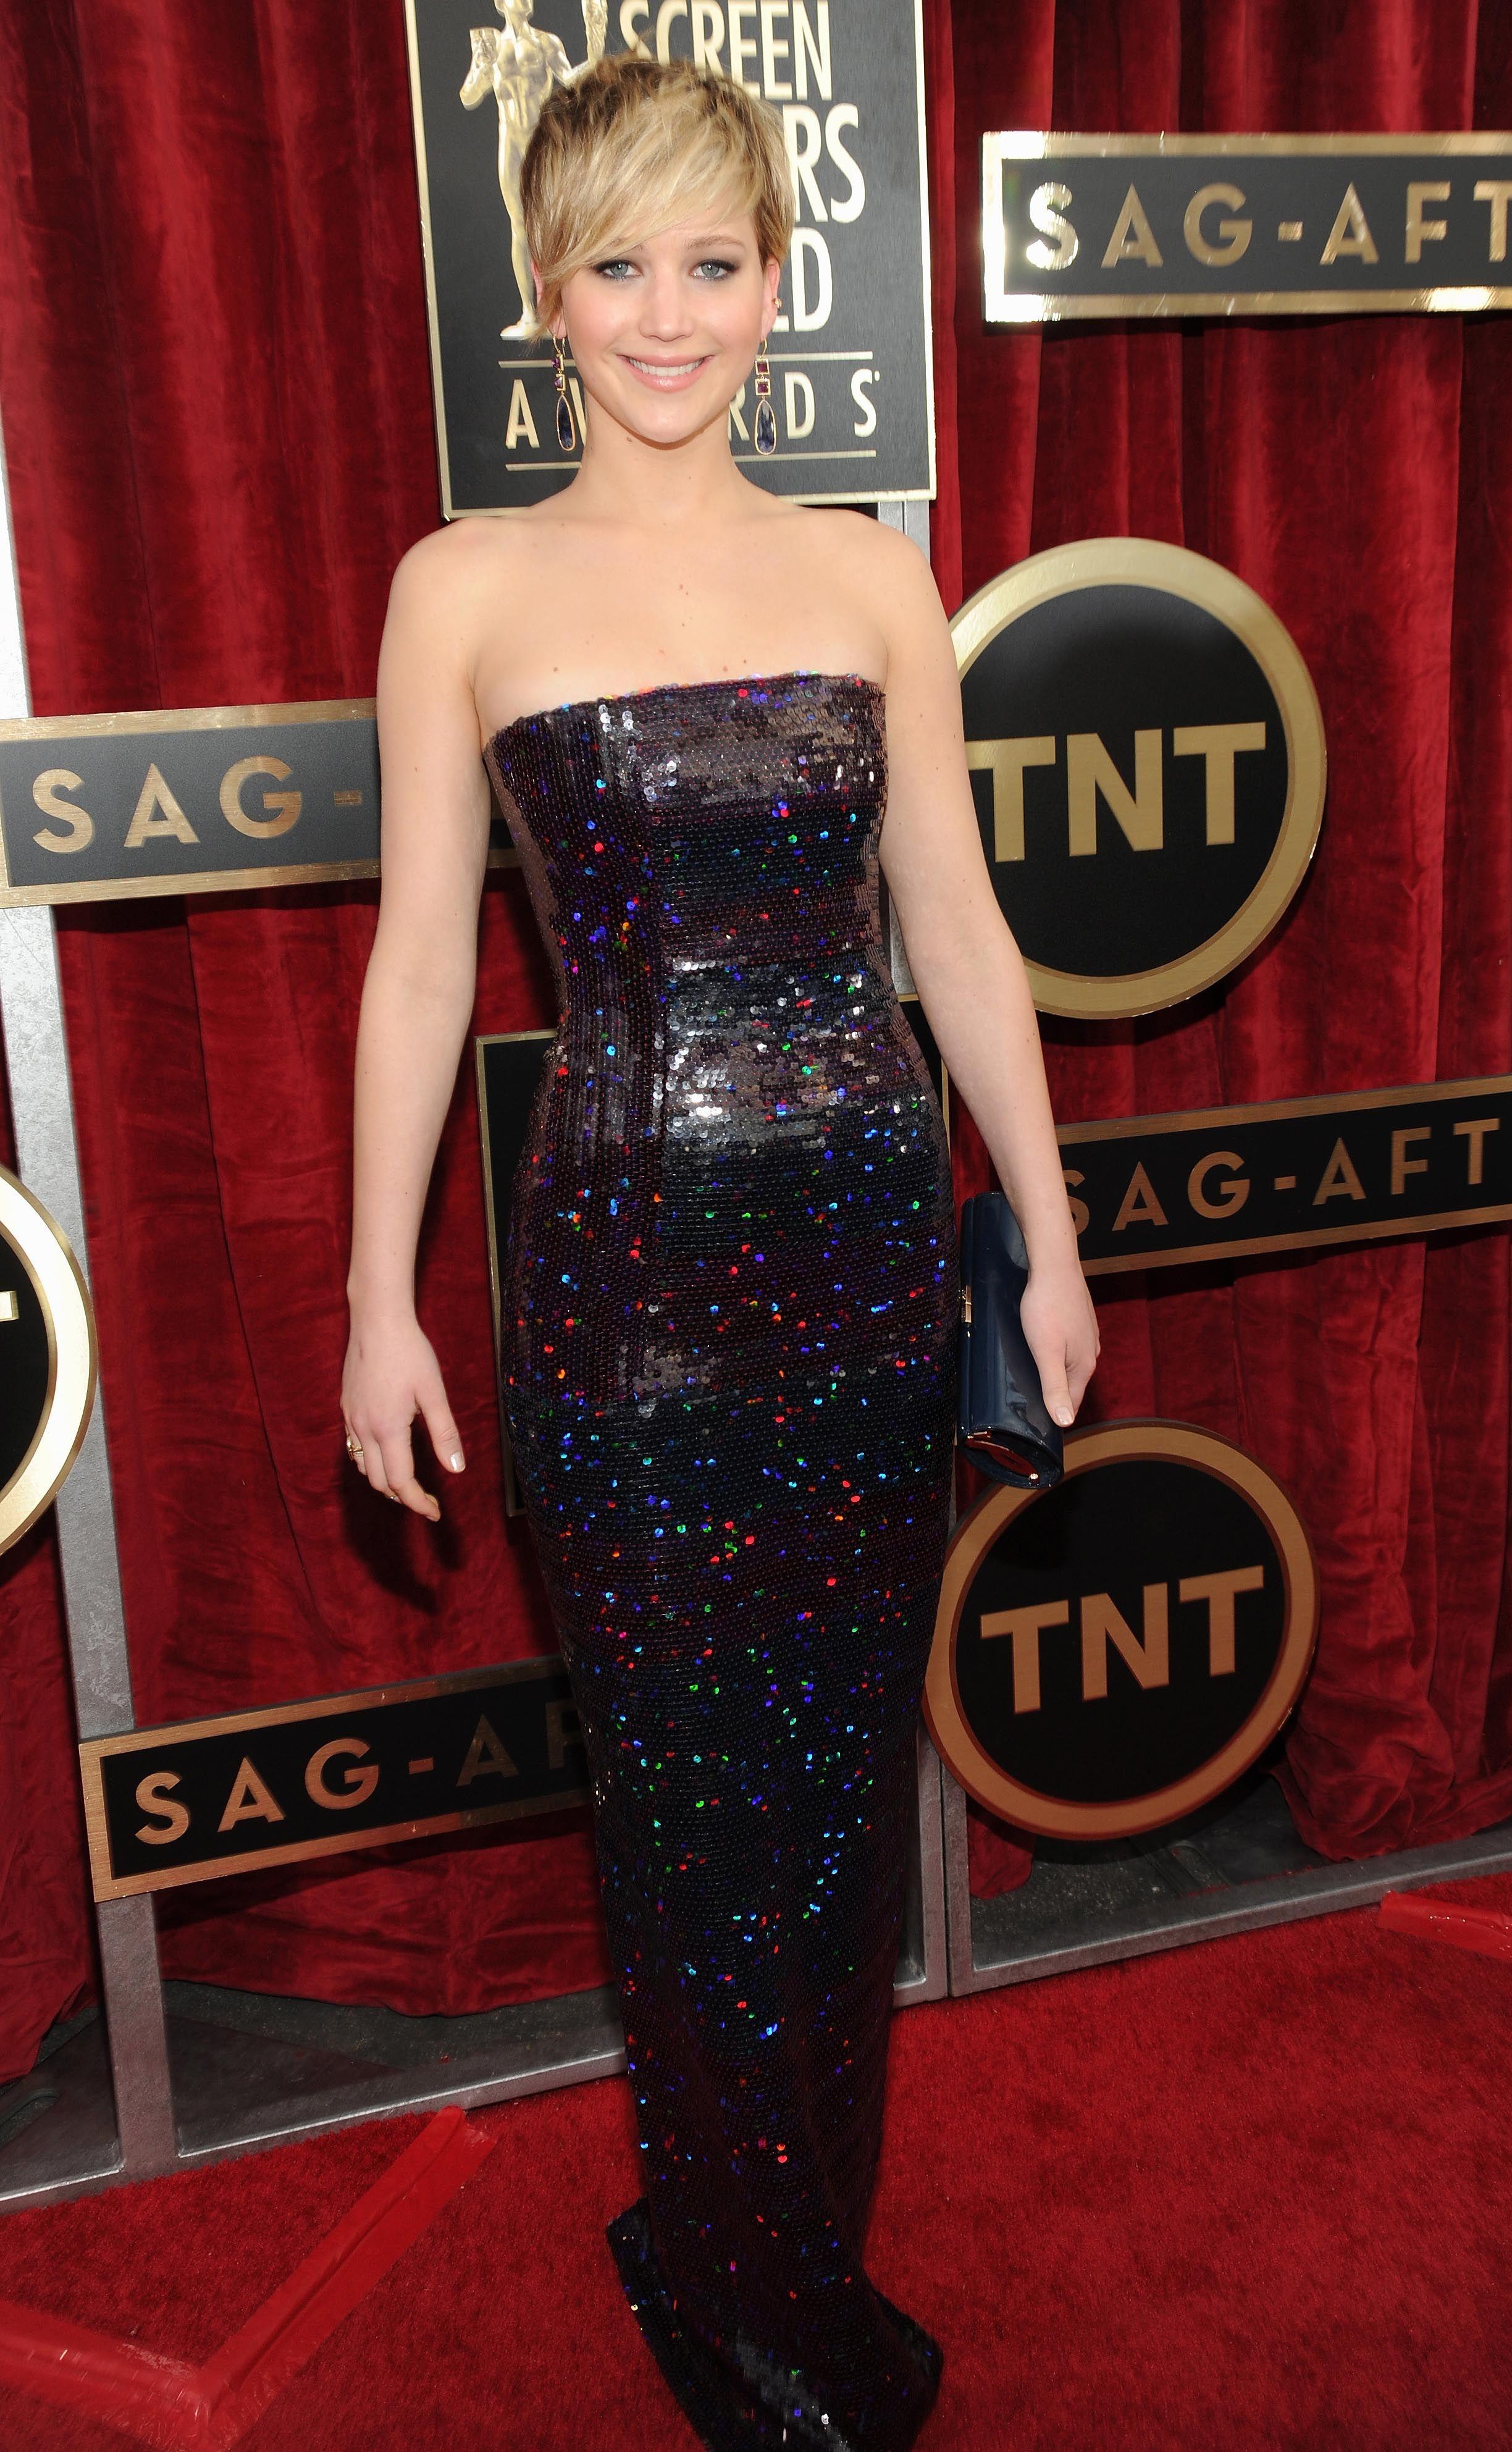 Sag Jennifer Lawrence1 Jpg 2448 3970 Vestidos Legais Vestidos Tapete Vermelho Ideias Fashion